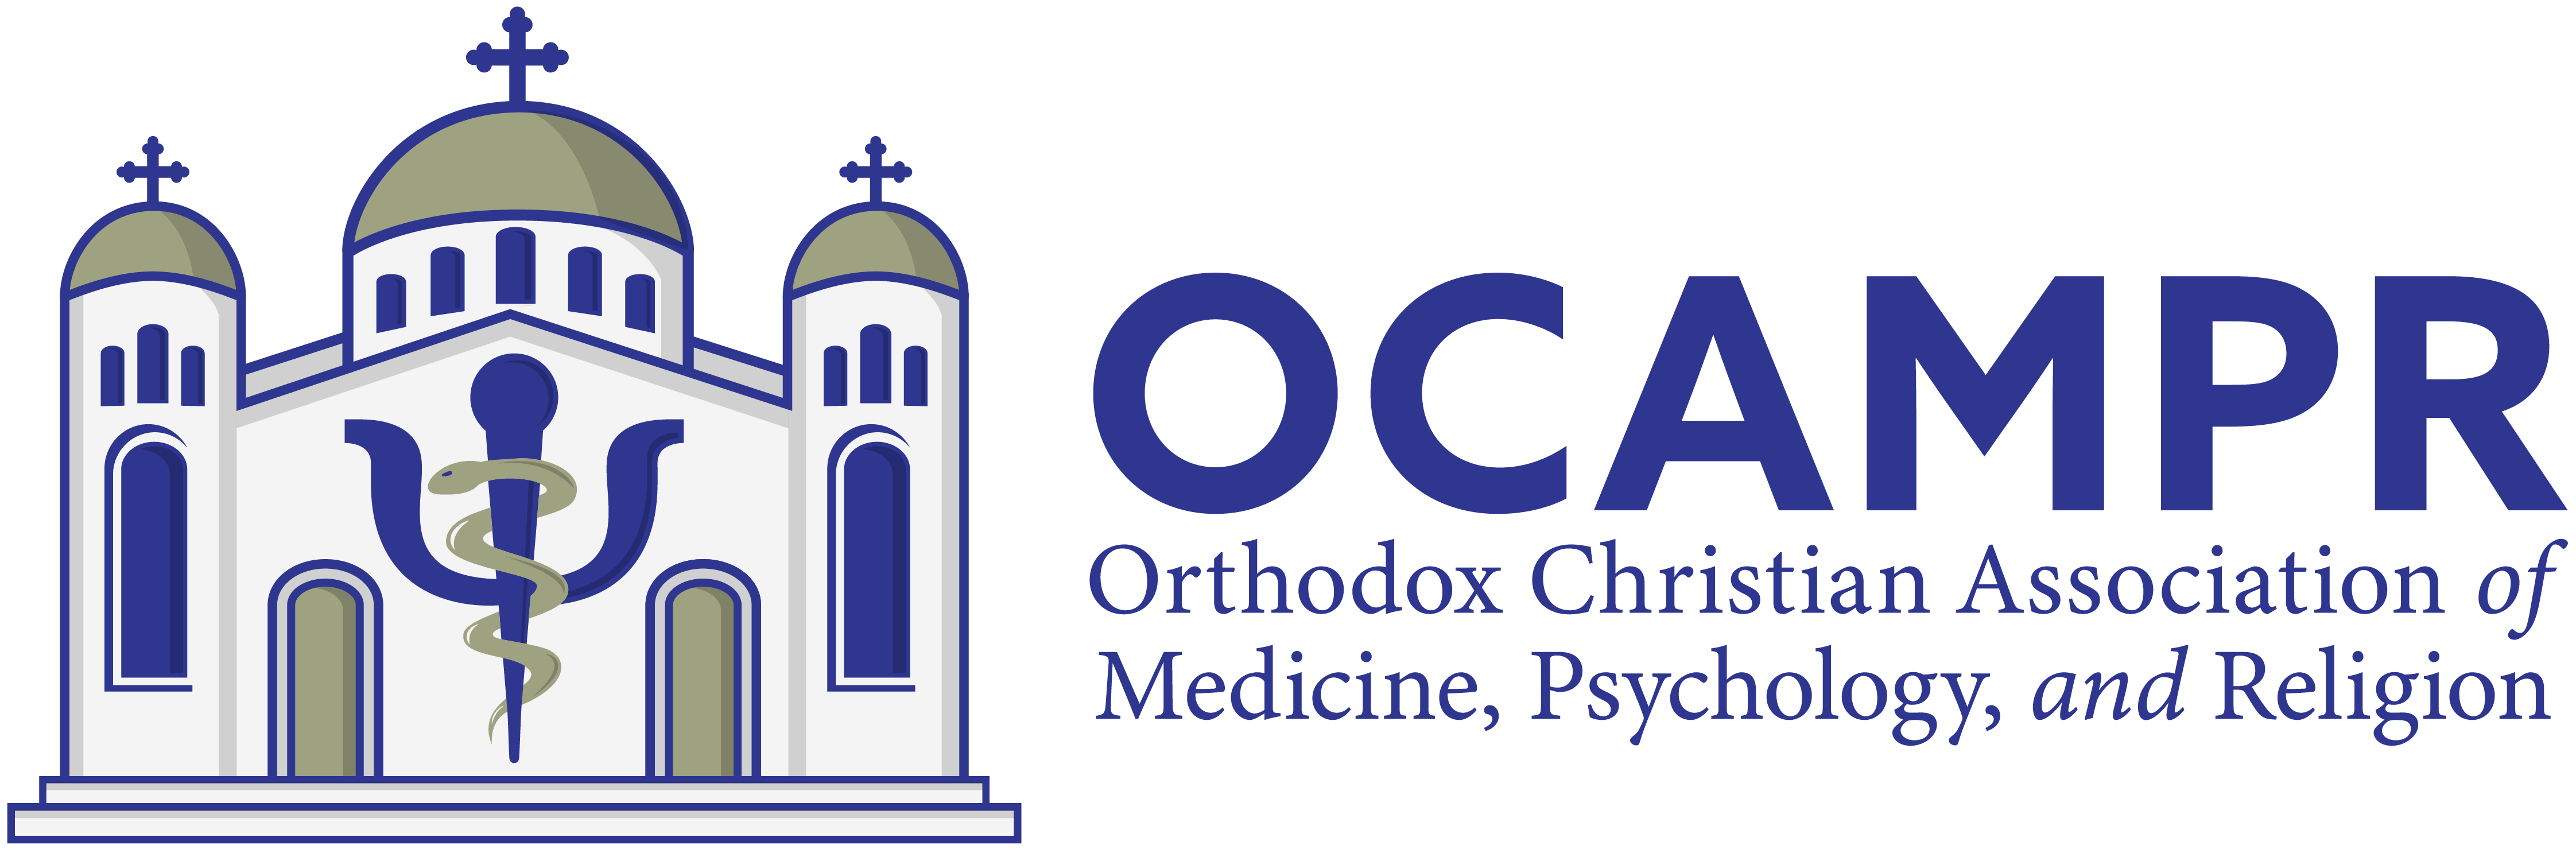 OCAMPR | Orthodox Christian Association of Medicine, Psychology, and Religion